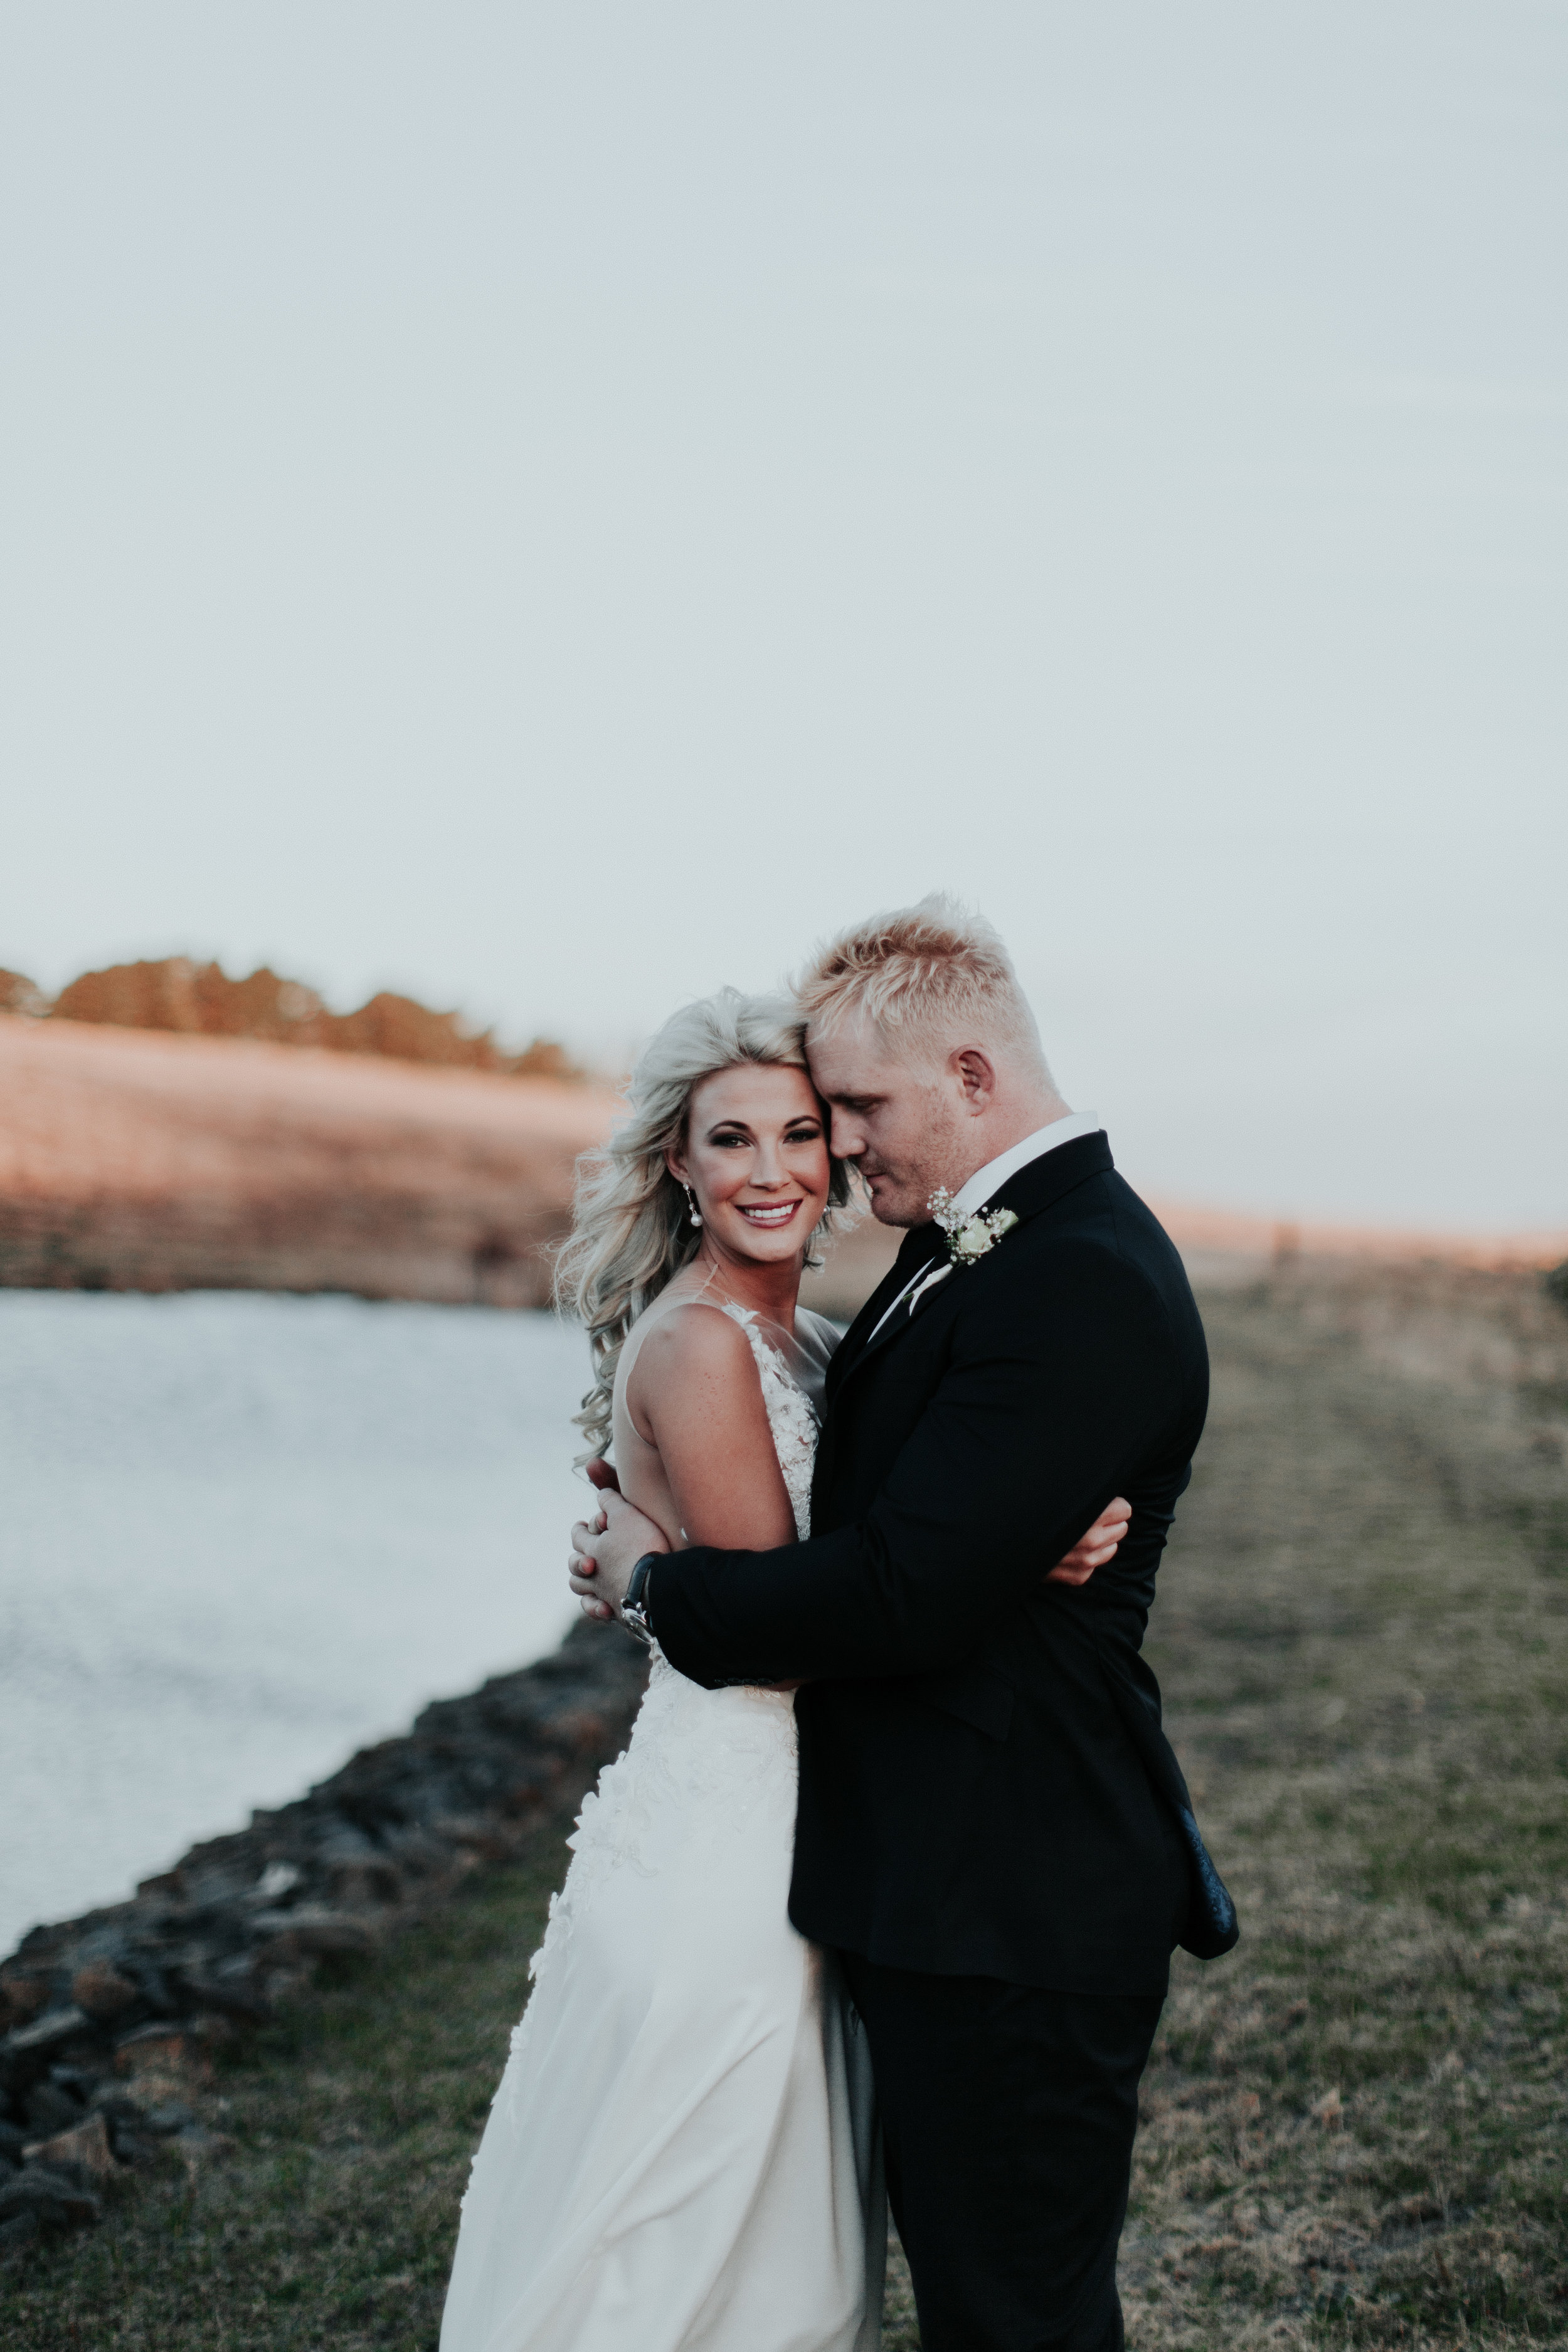 Kristi Smith Photography_Vincent&Jandre_ Wedding Photographer 23.jpg